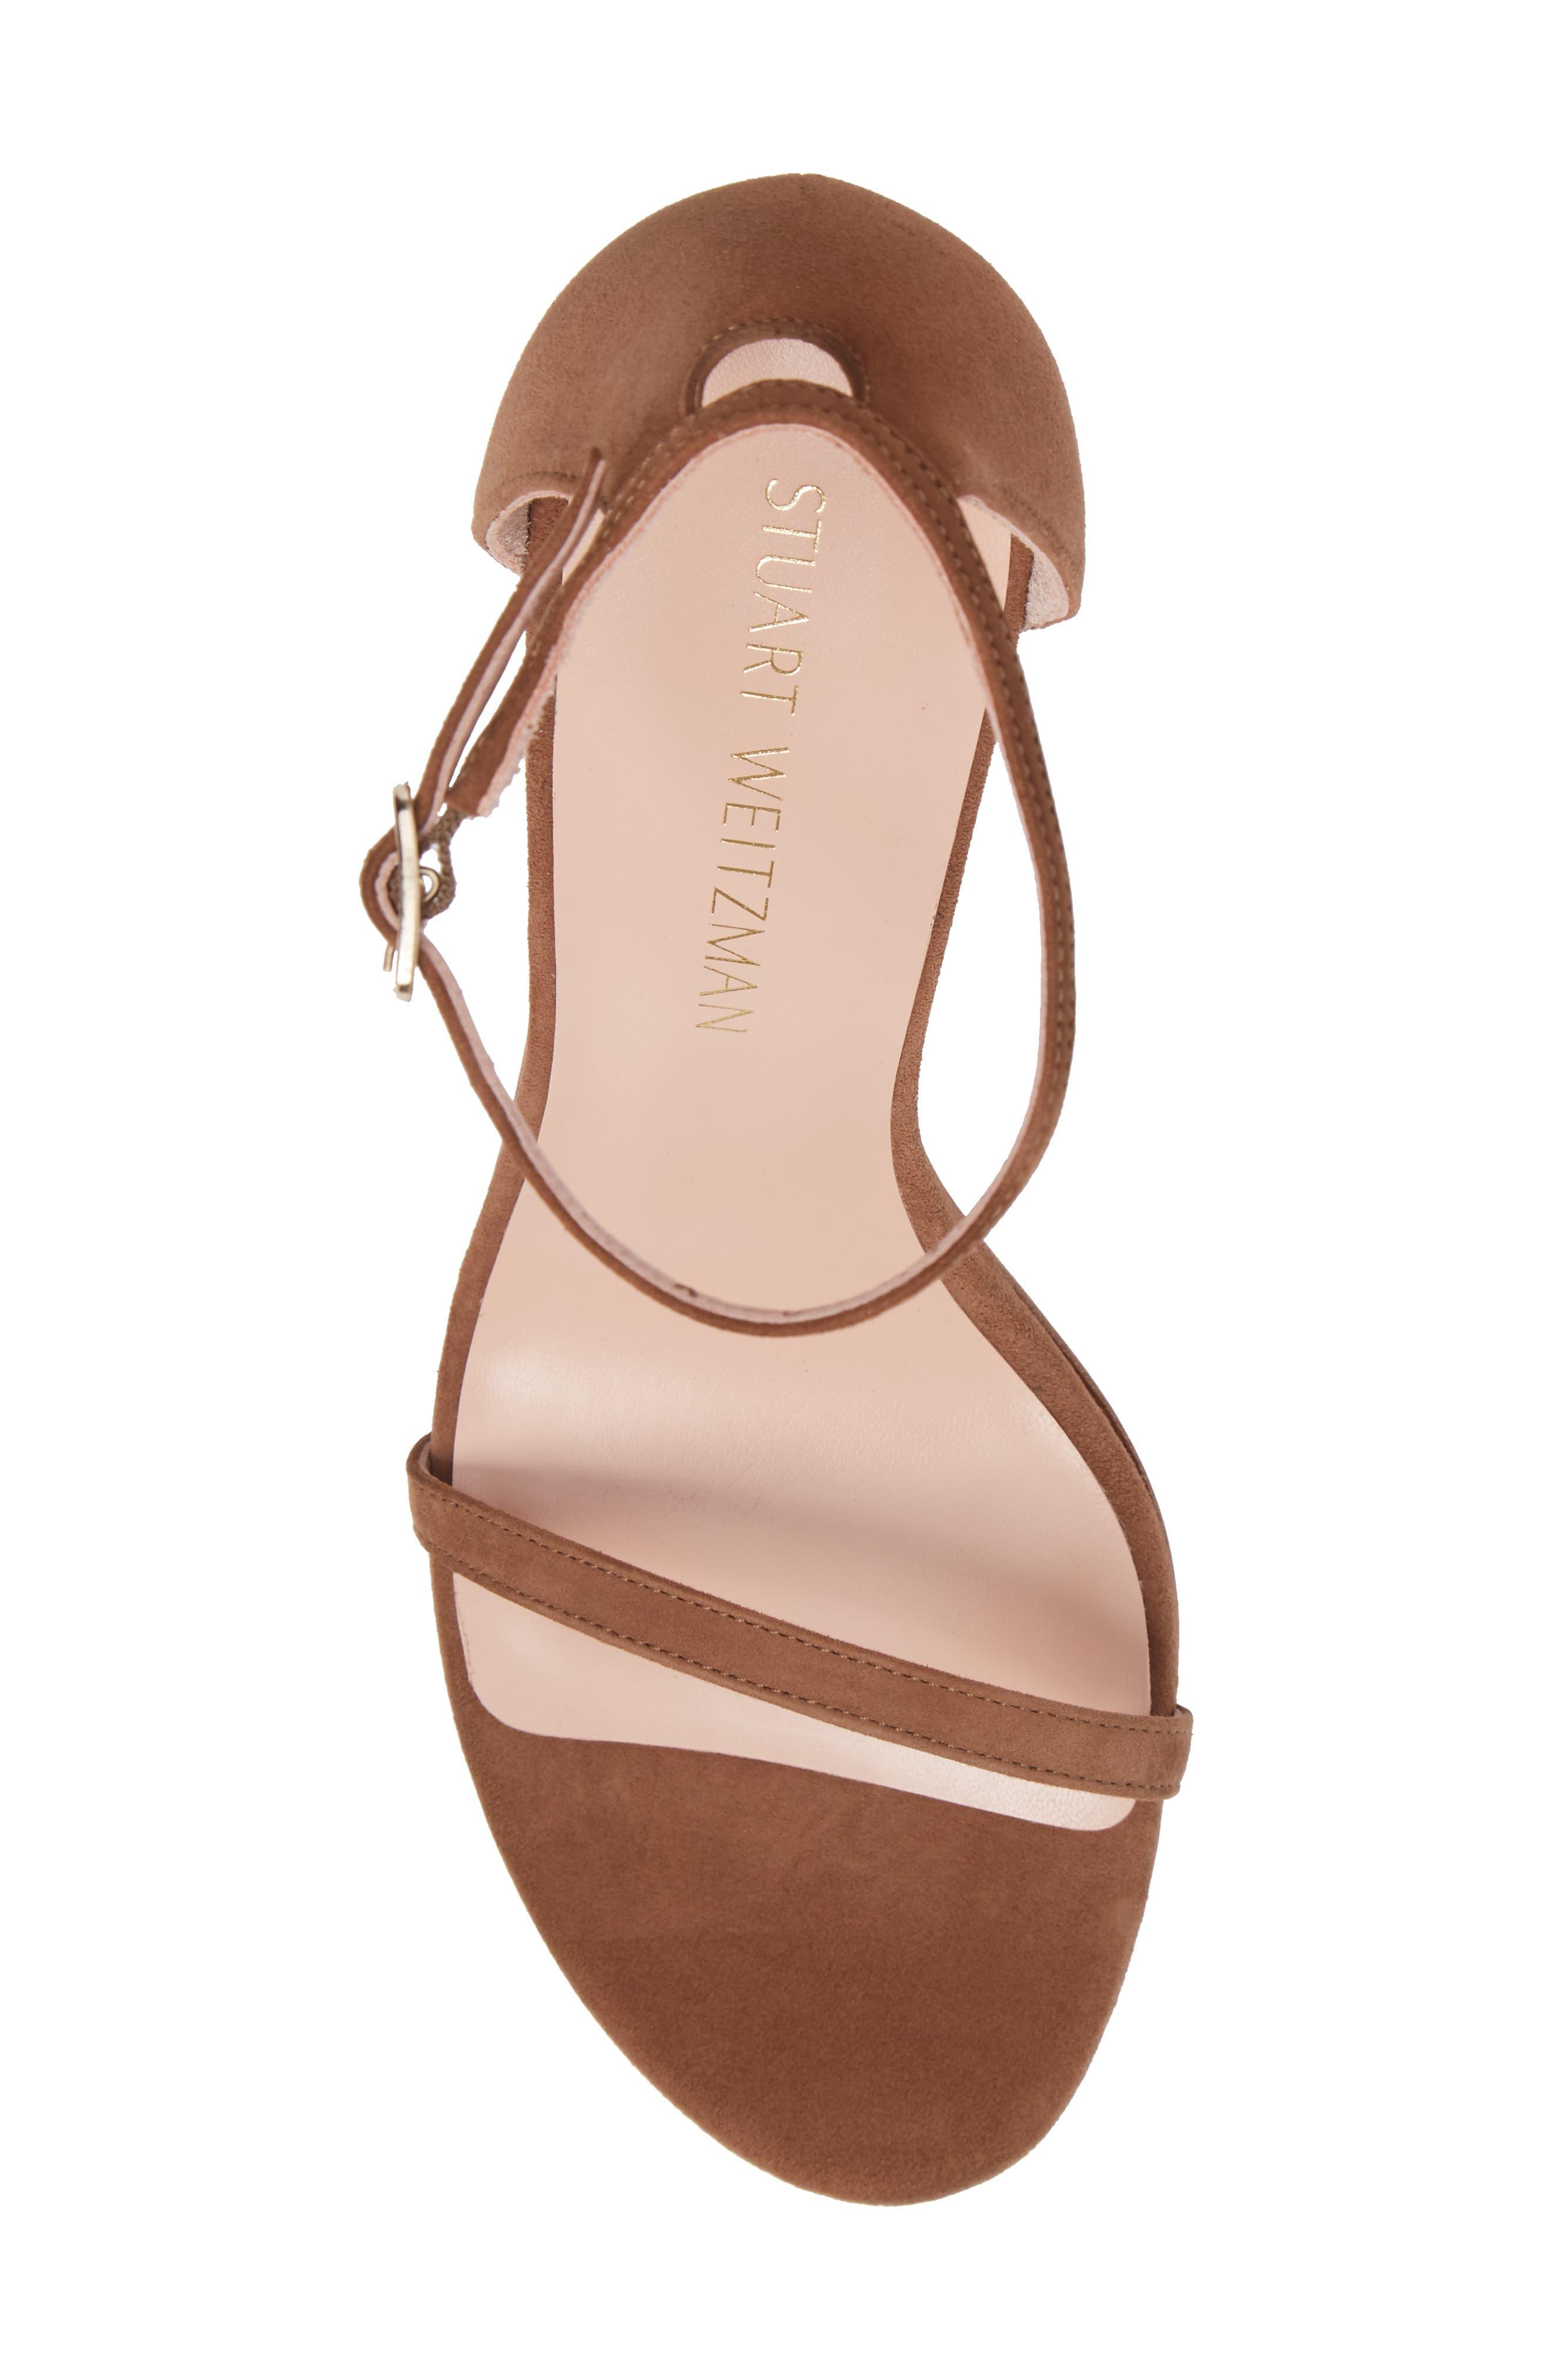 Nudistsong Ankle Strap Sandal,                             Alternate thumbnail 173, color,